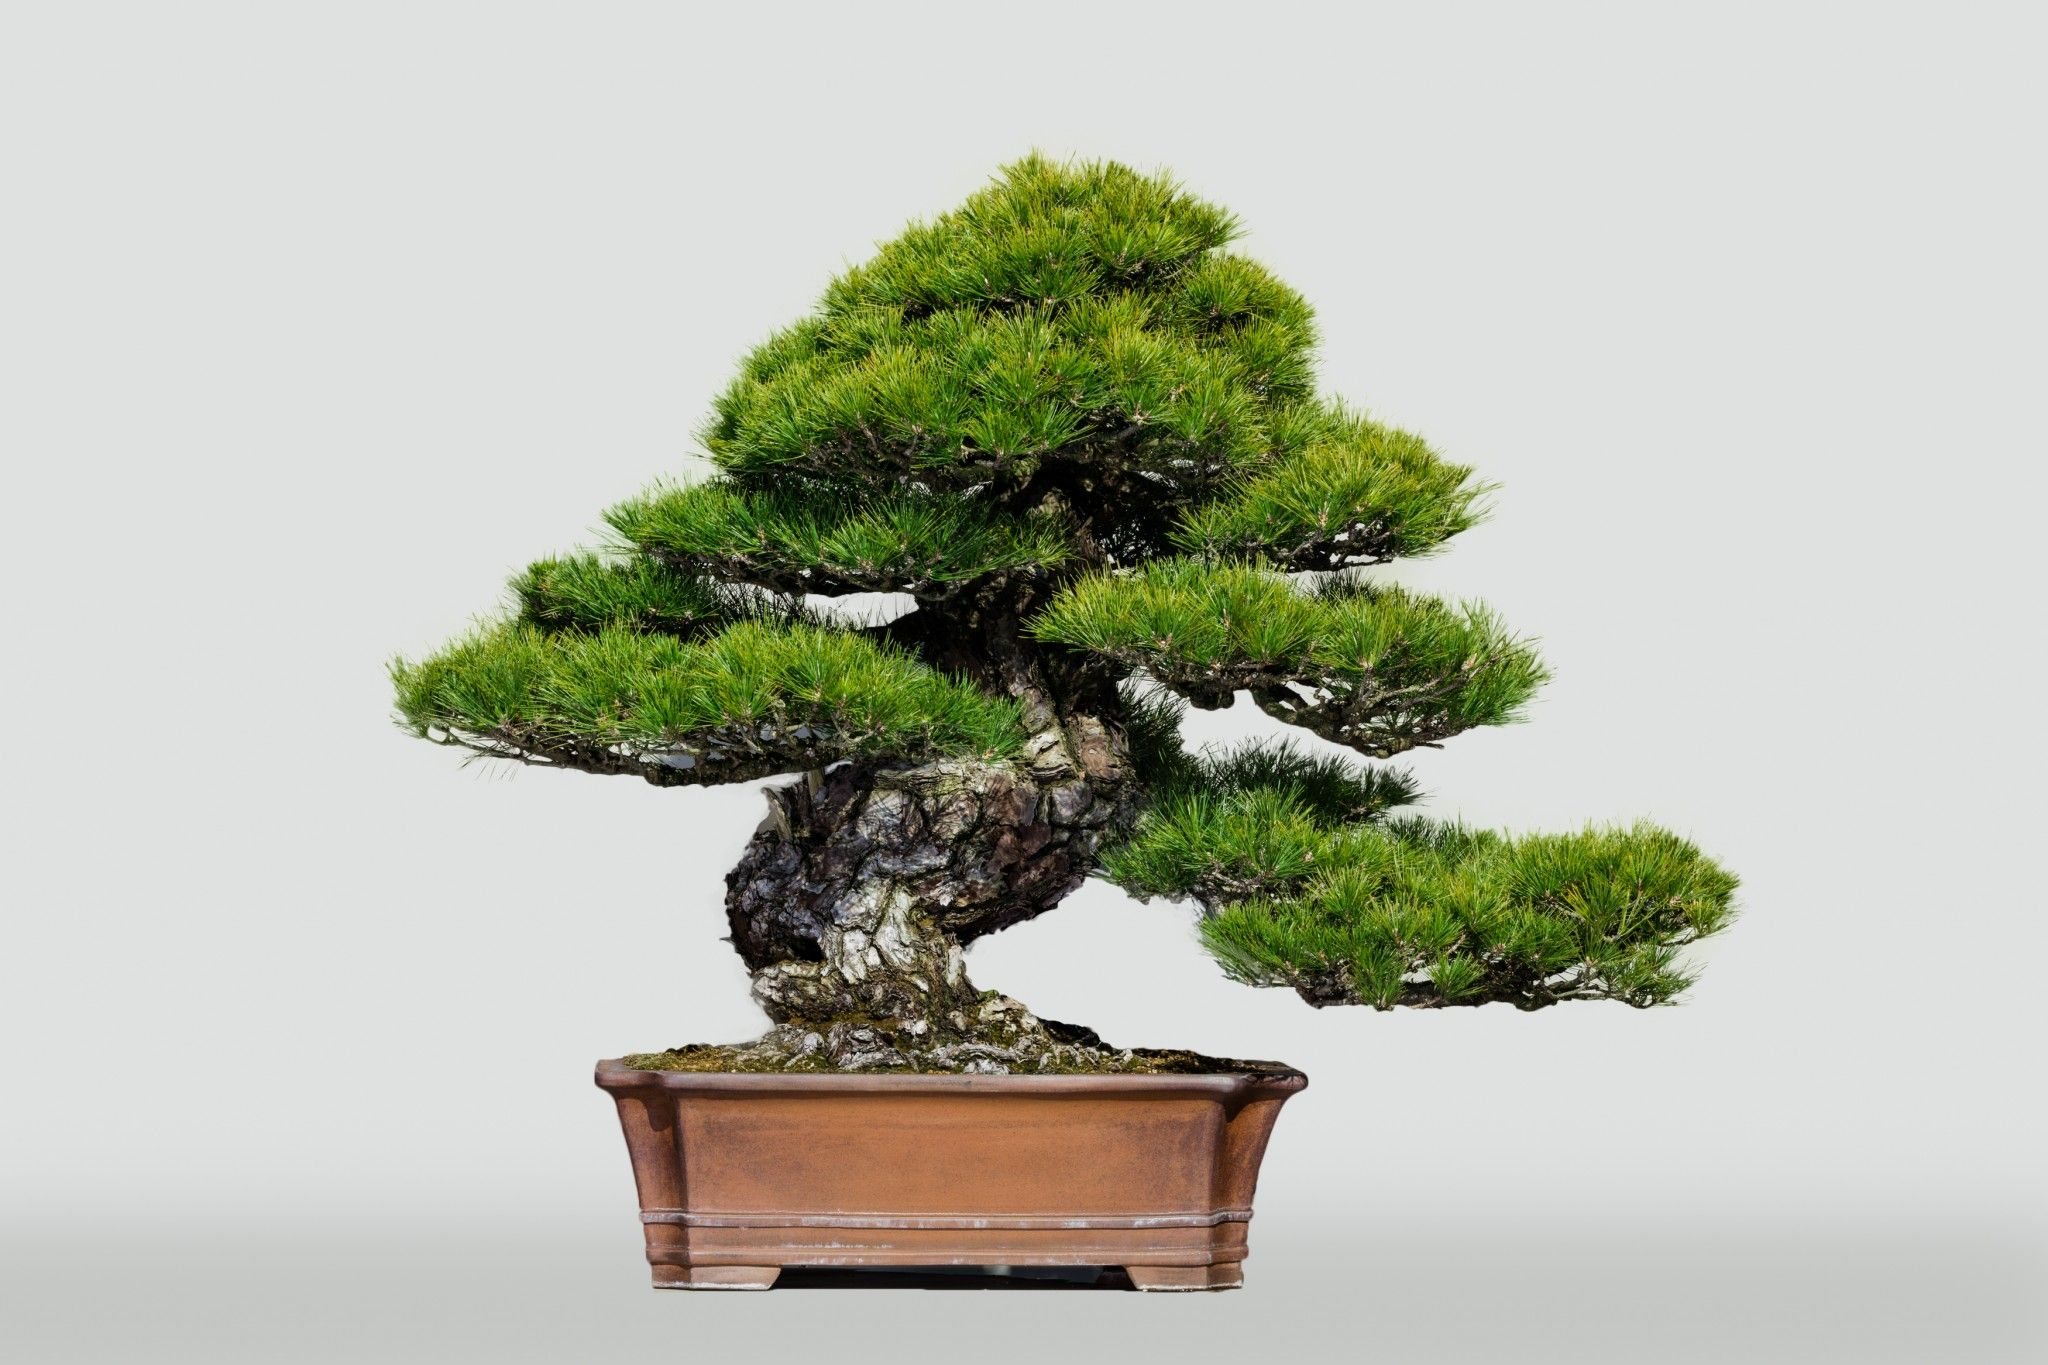 Kuro Matsu Black Pine The Omiya Bonsai Art Museum Saitama Bonsai Art Pine Bonsai Bonsai Garden